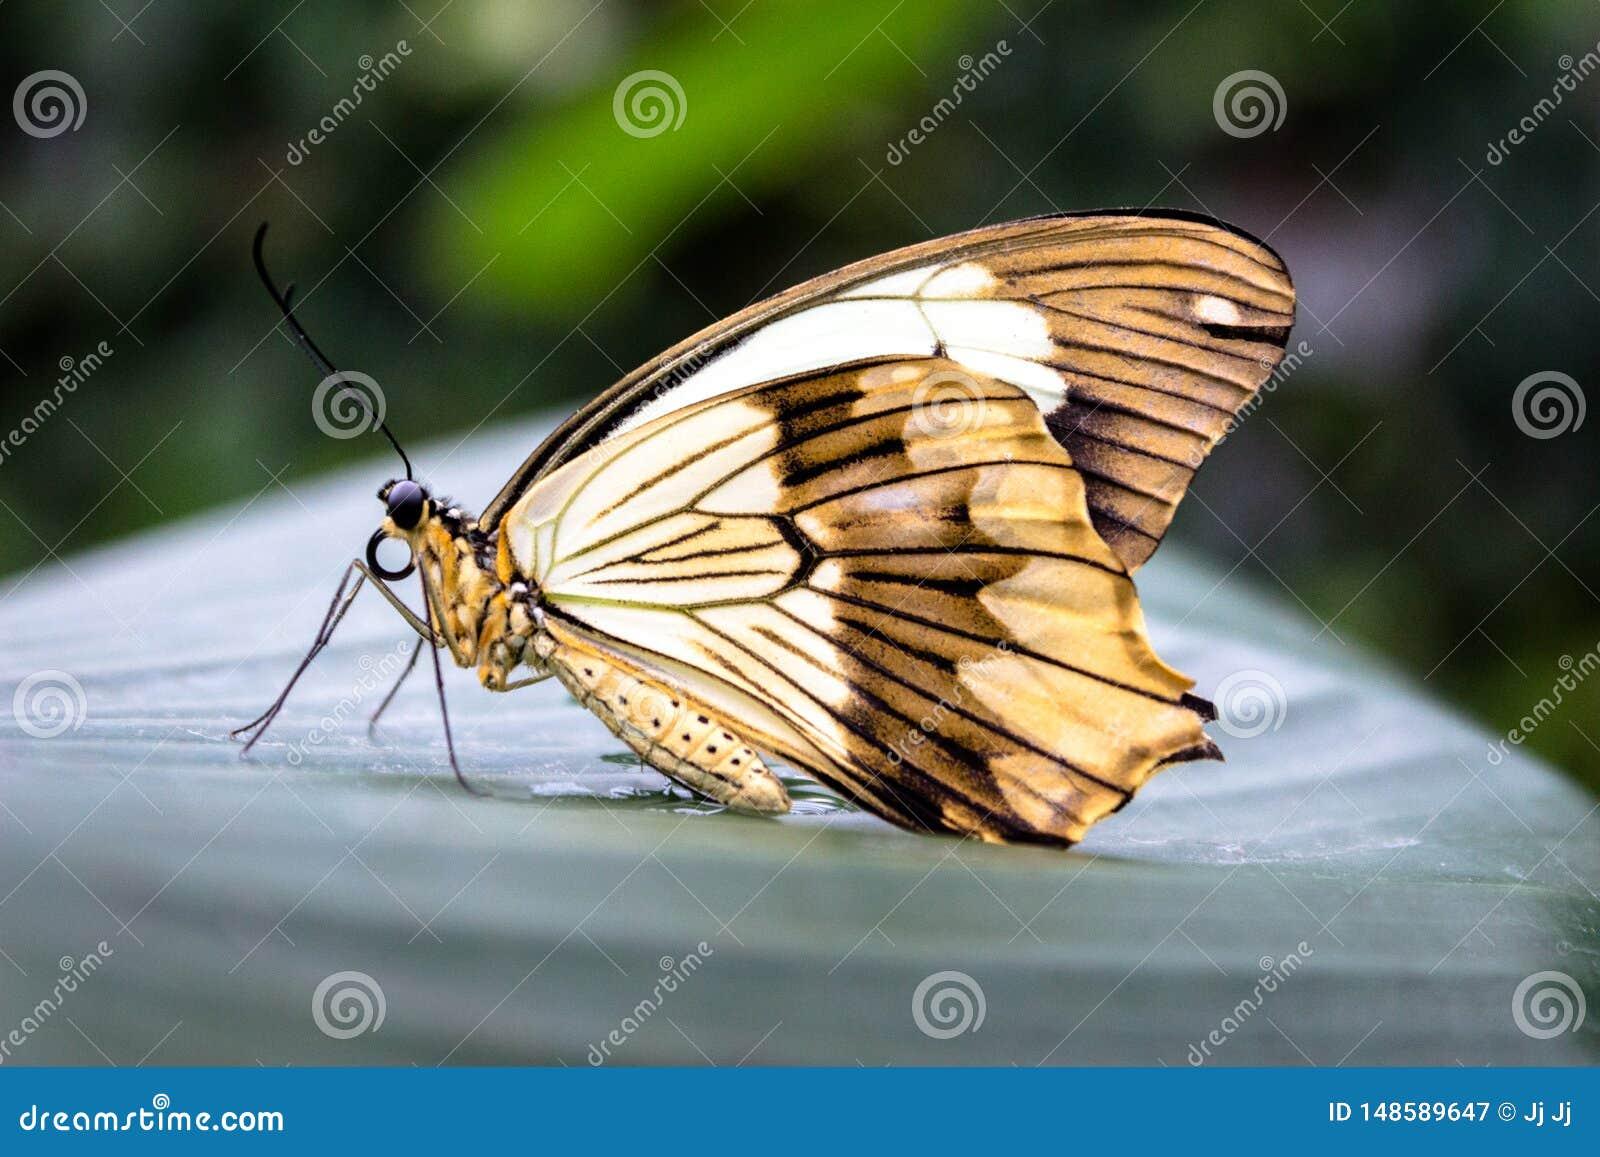 Красивая желтая бабочка на лист